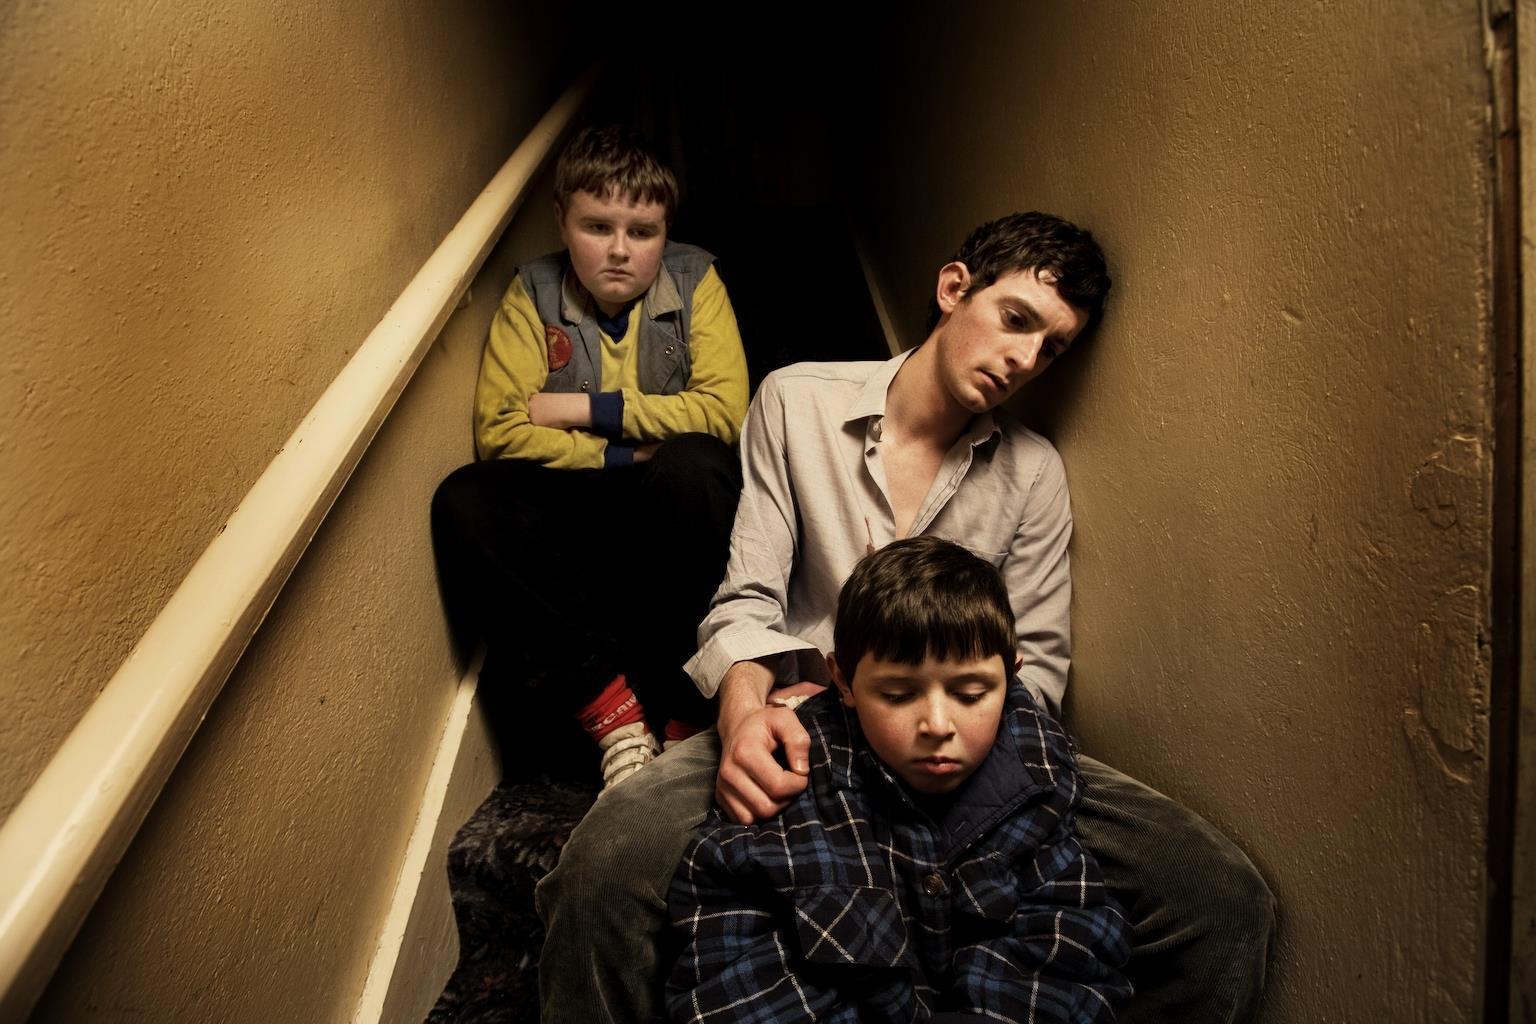 Tribeca Film Festival 2010: My Brothers